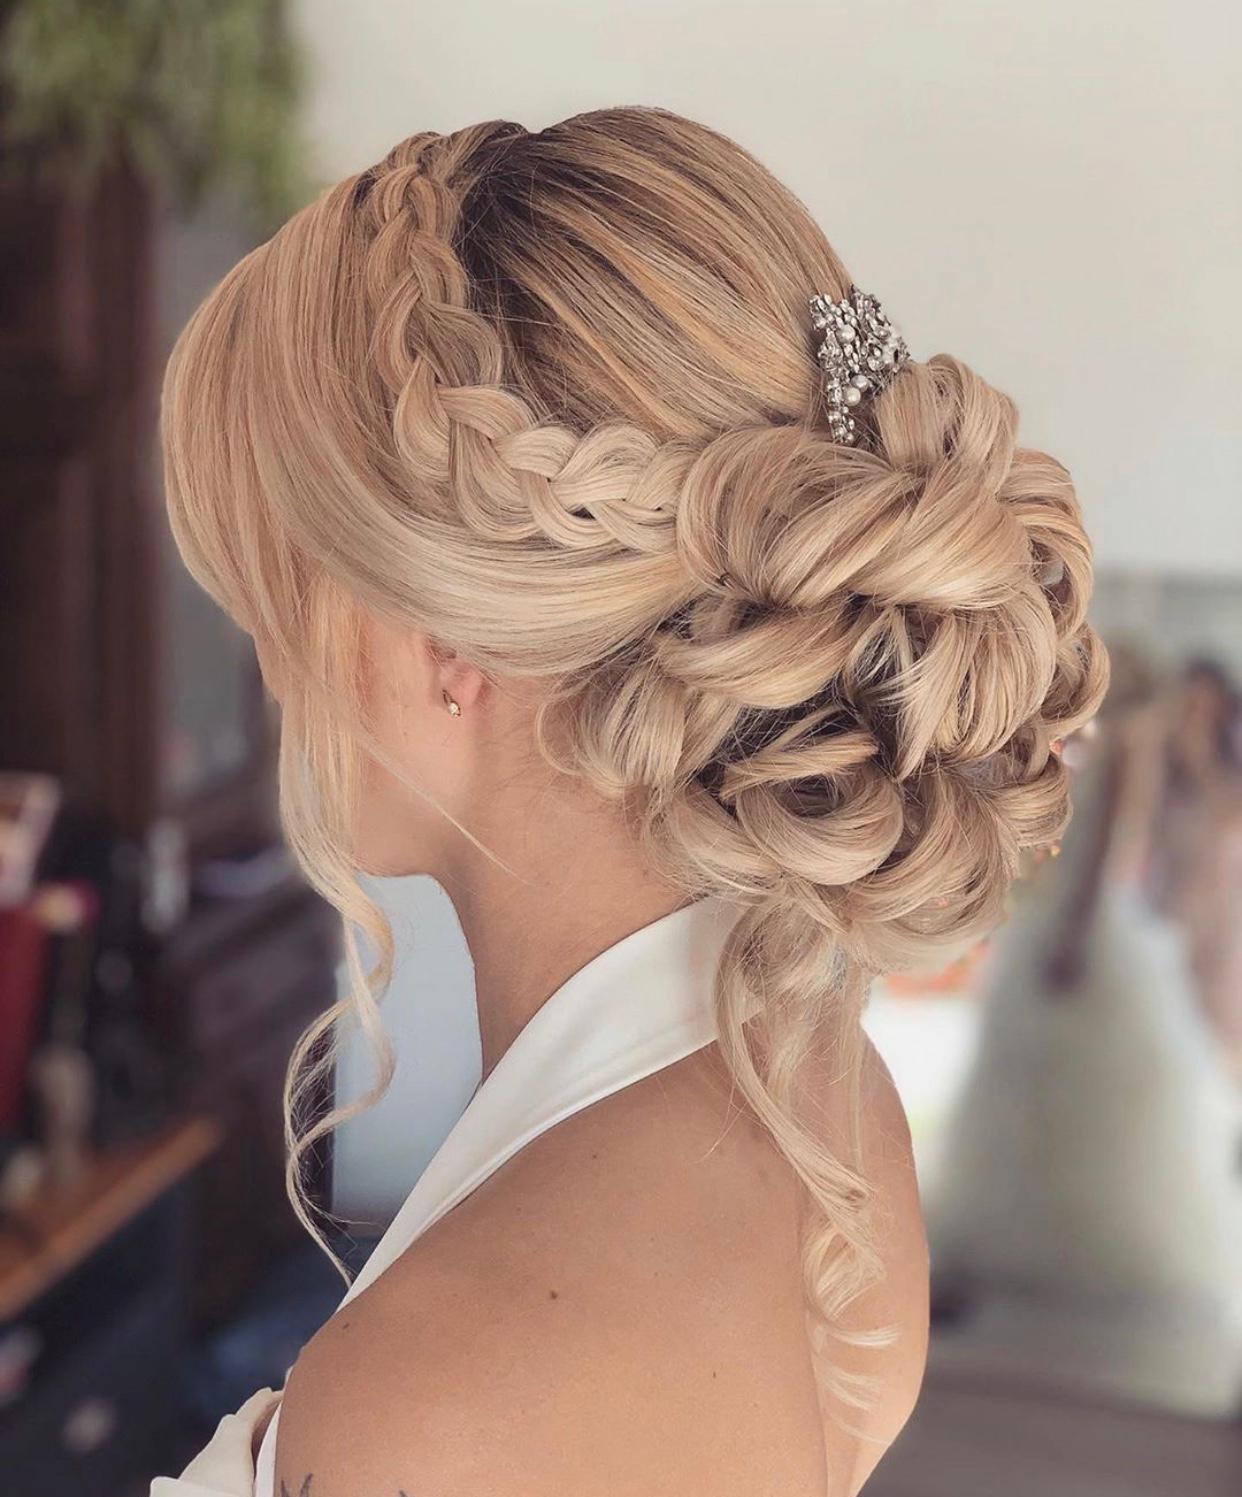 aml-nantes-emmanuelle-coiffure-lissage-04-32-2